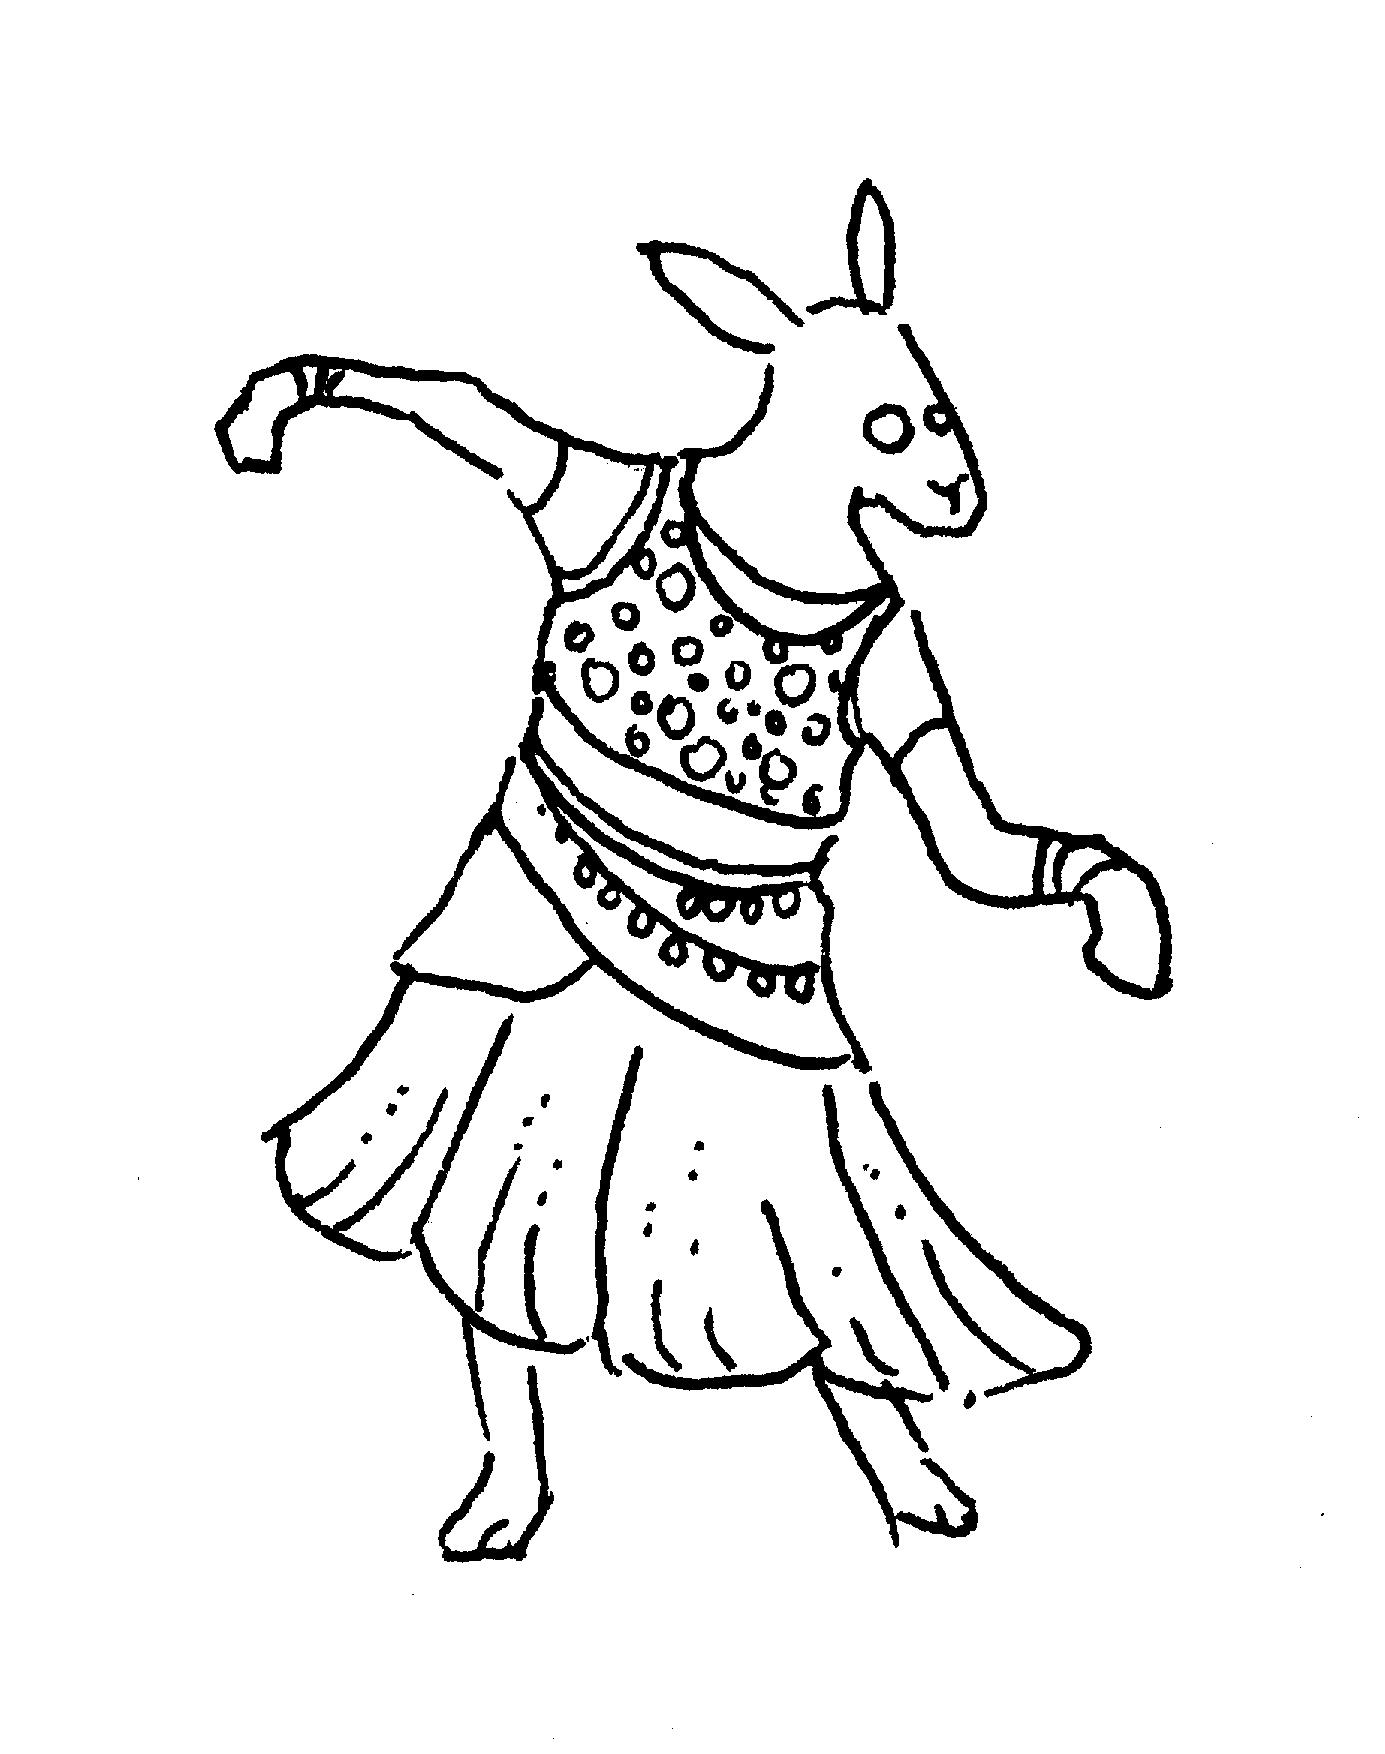 belly-dance001.jpg